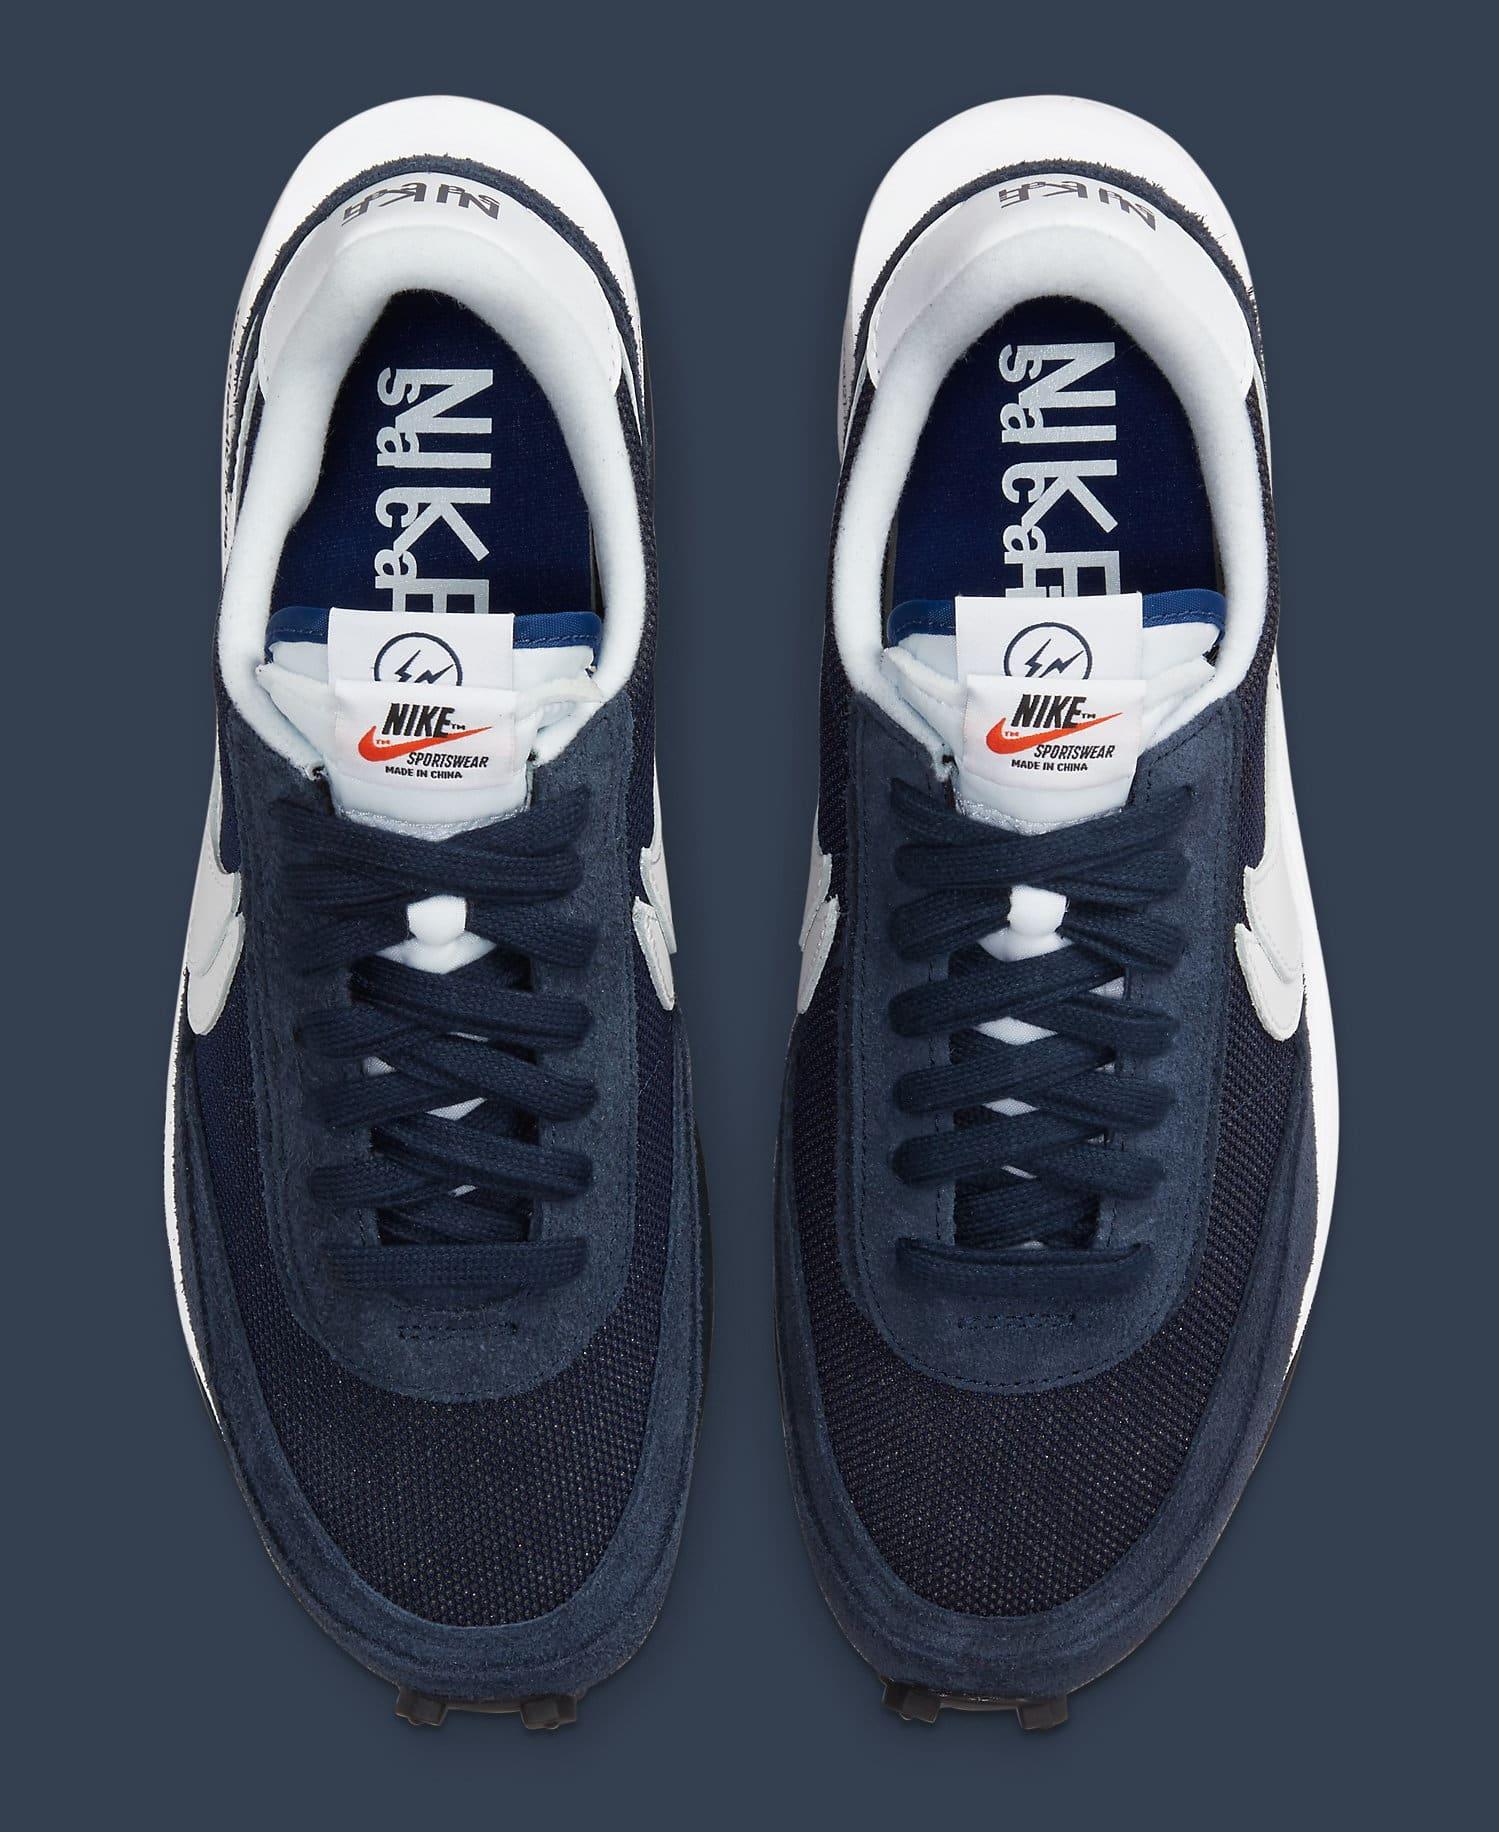 Fragment x Sacai x Nike LDWaffle 'Blackened Blue' DH2684-400 Top